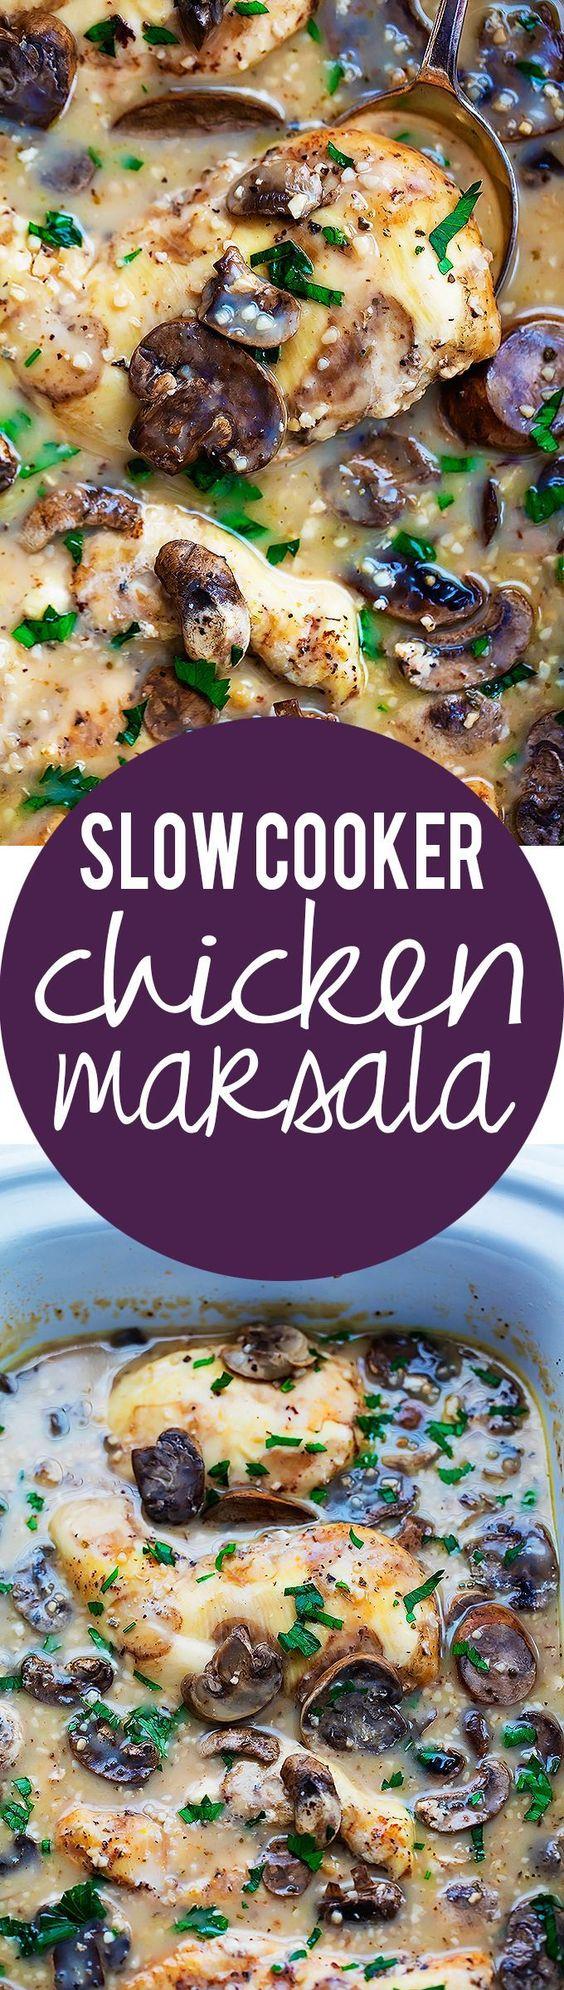 Slow Cooker Chicken Marsala   Recipe   Slow cooker chicken ...